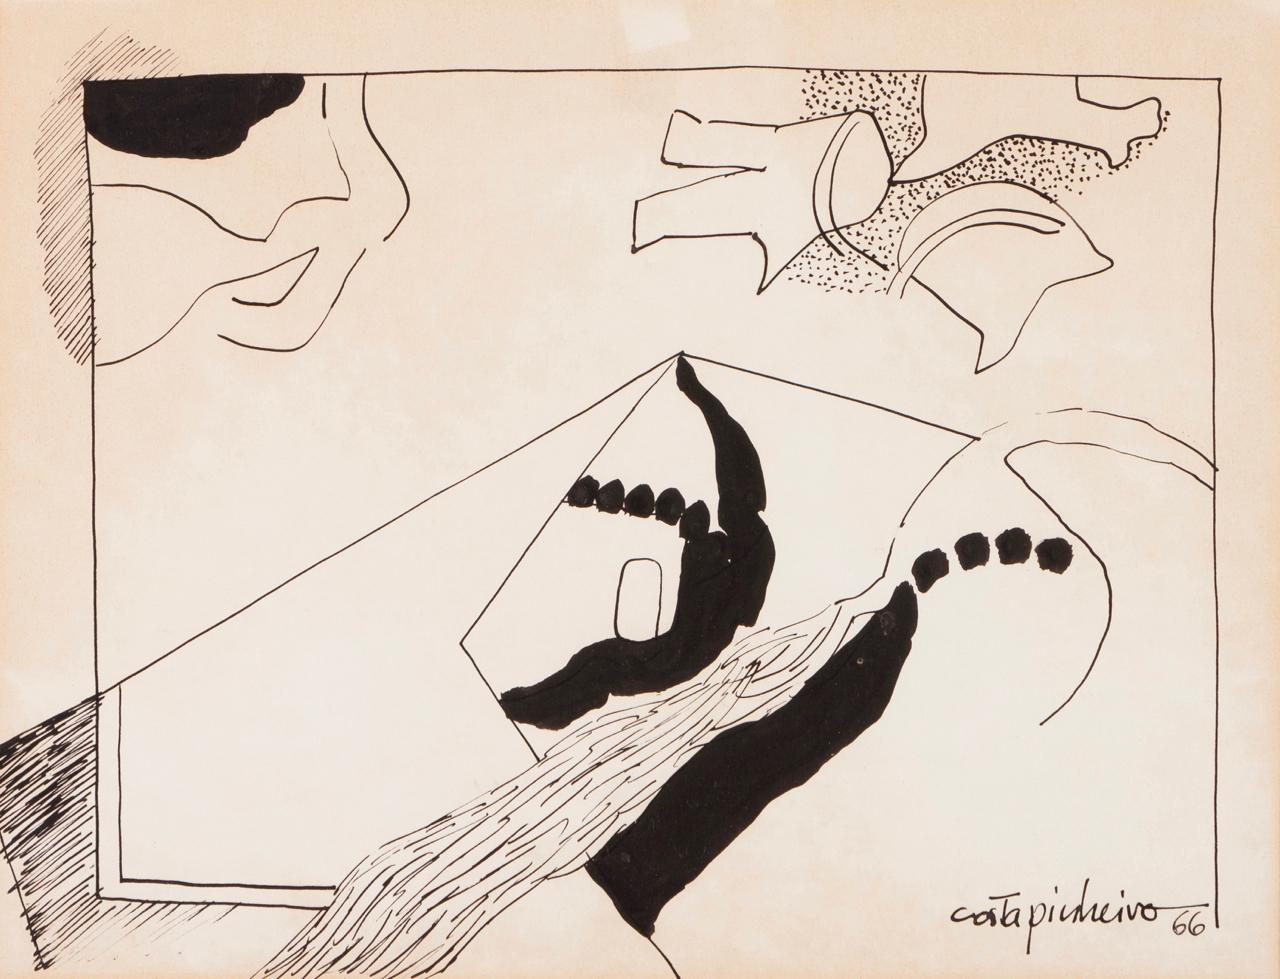 Costa Pinheiro-Untitled-1966